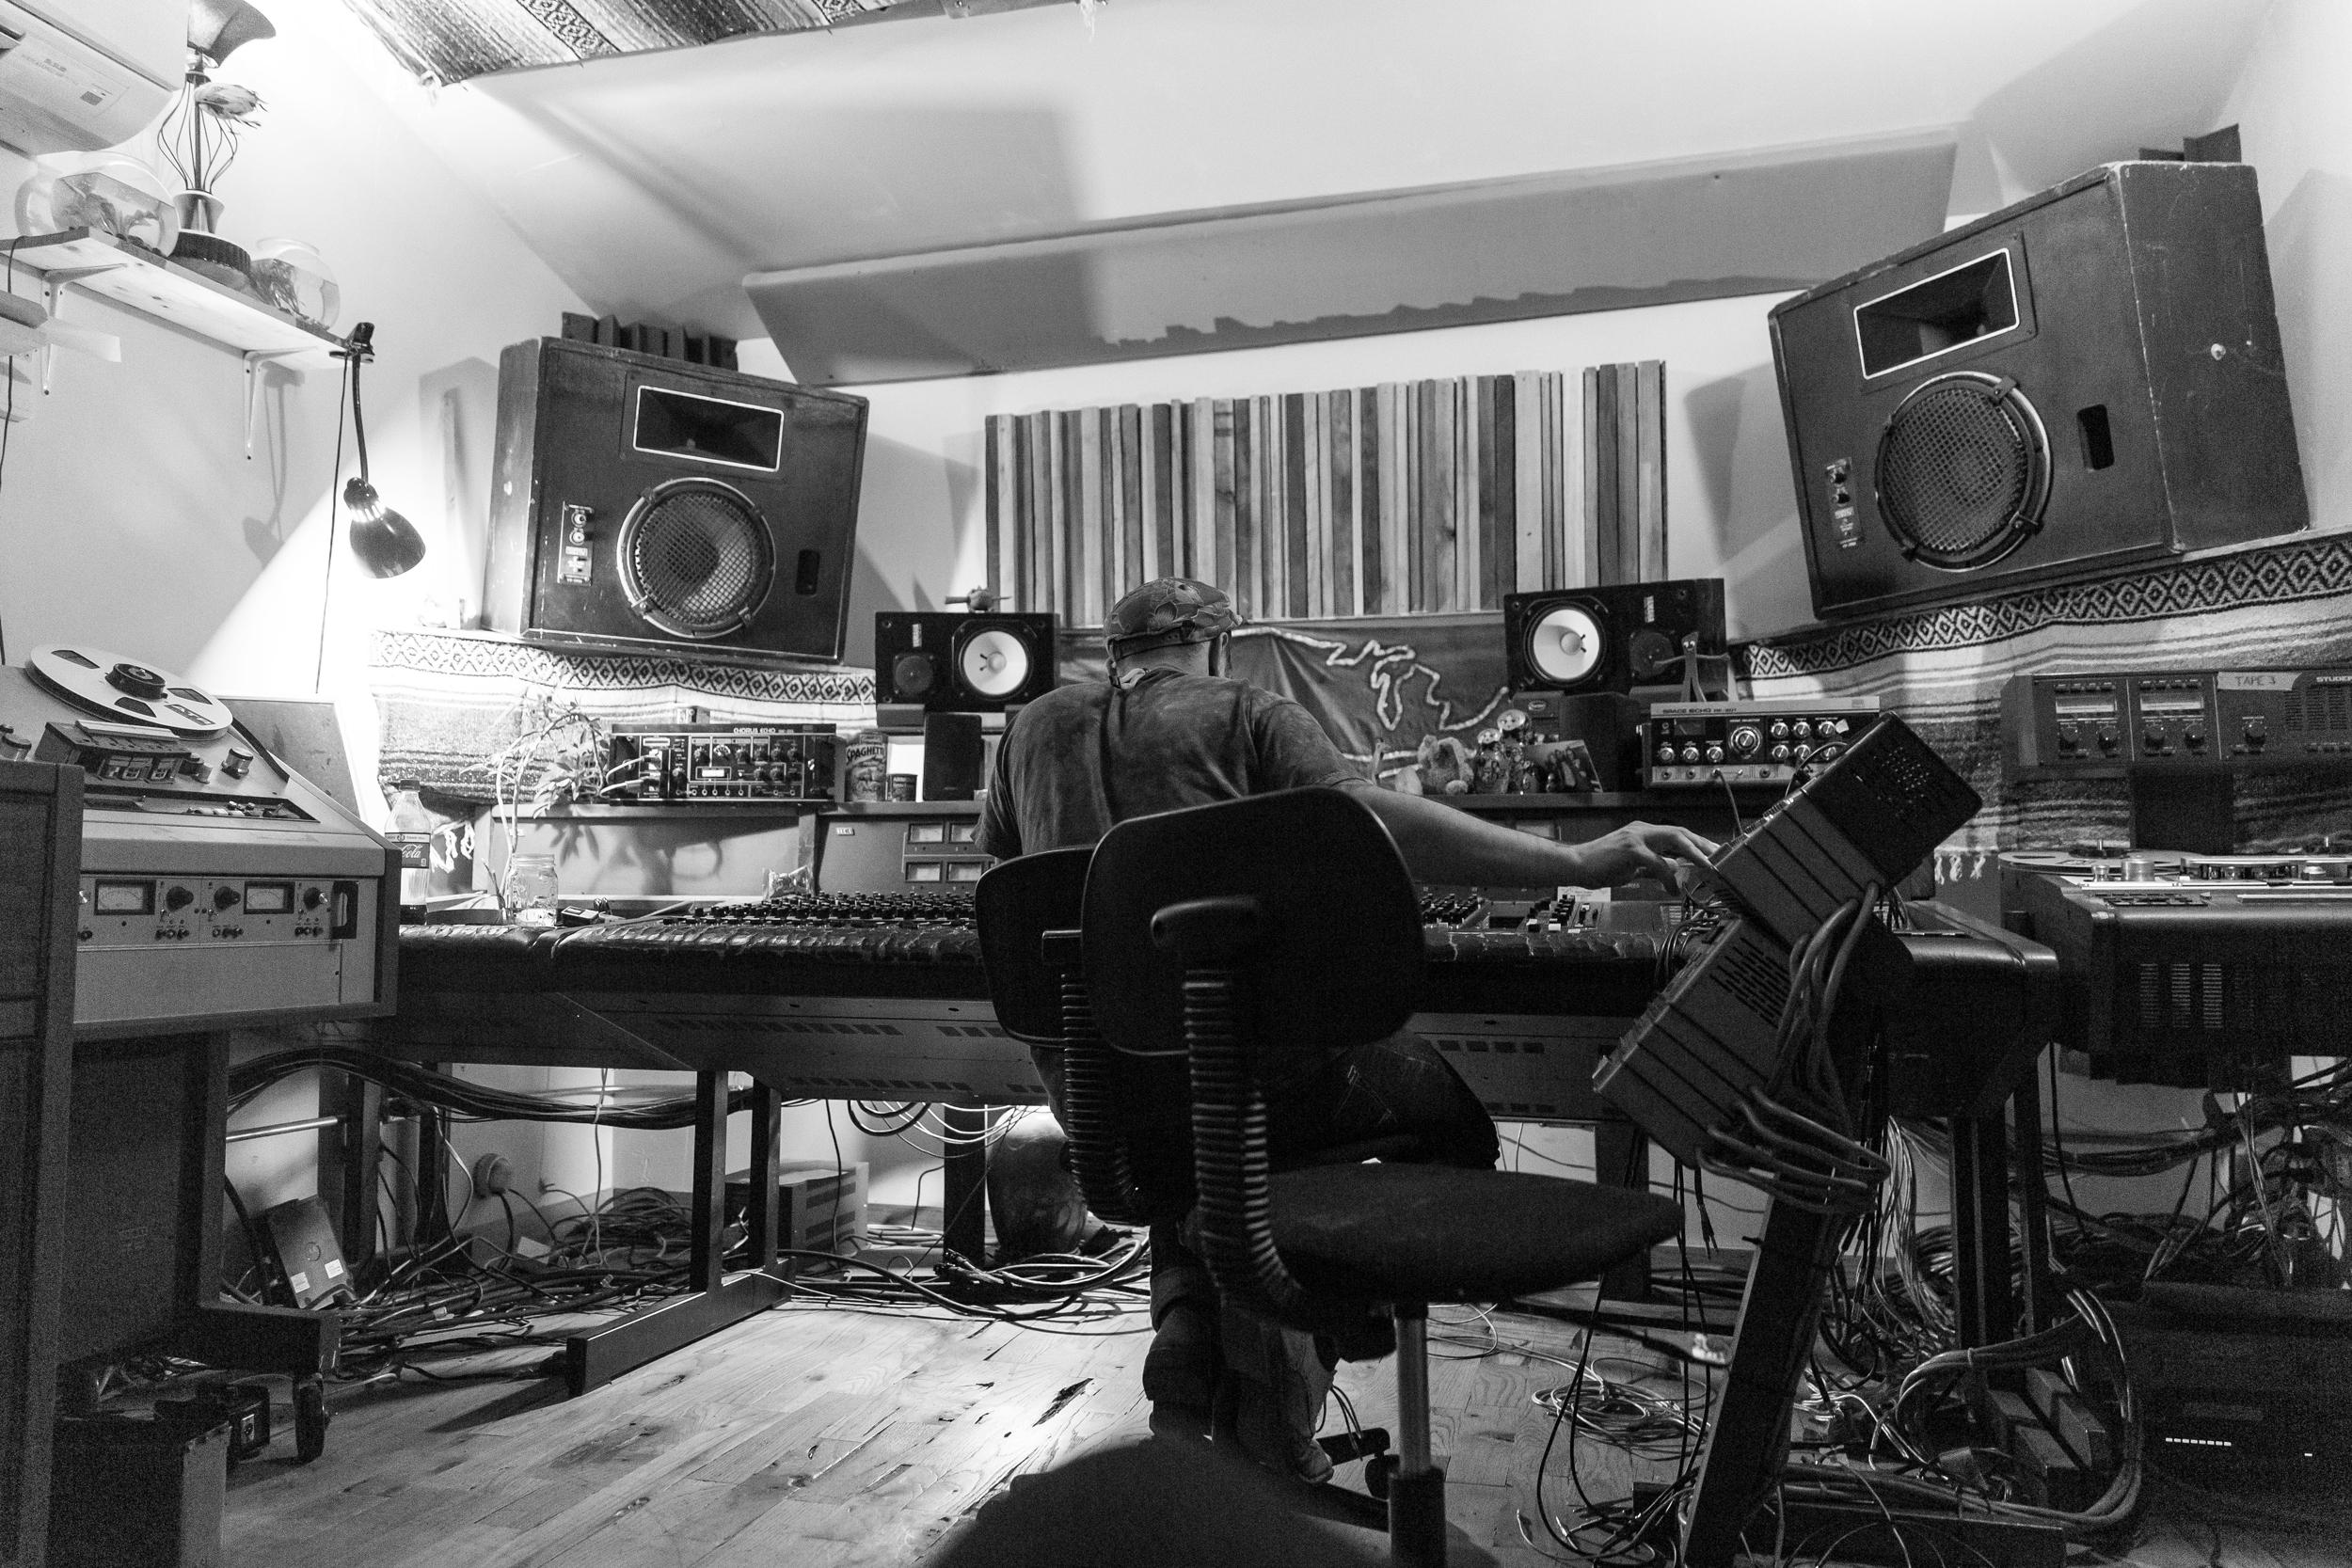 The Producers: Andrija Tokic